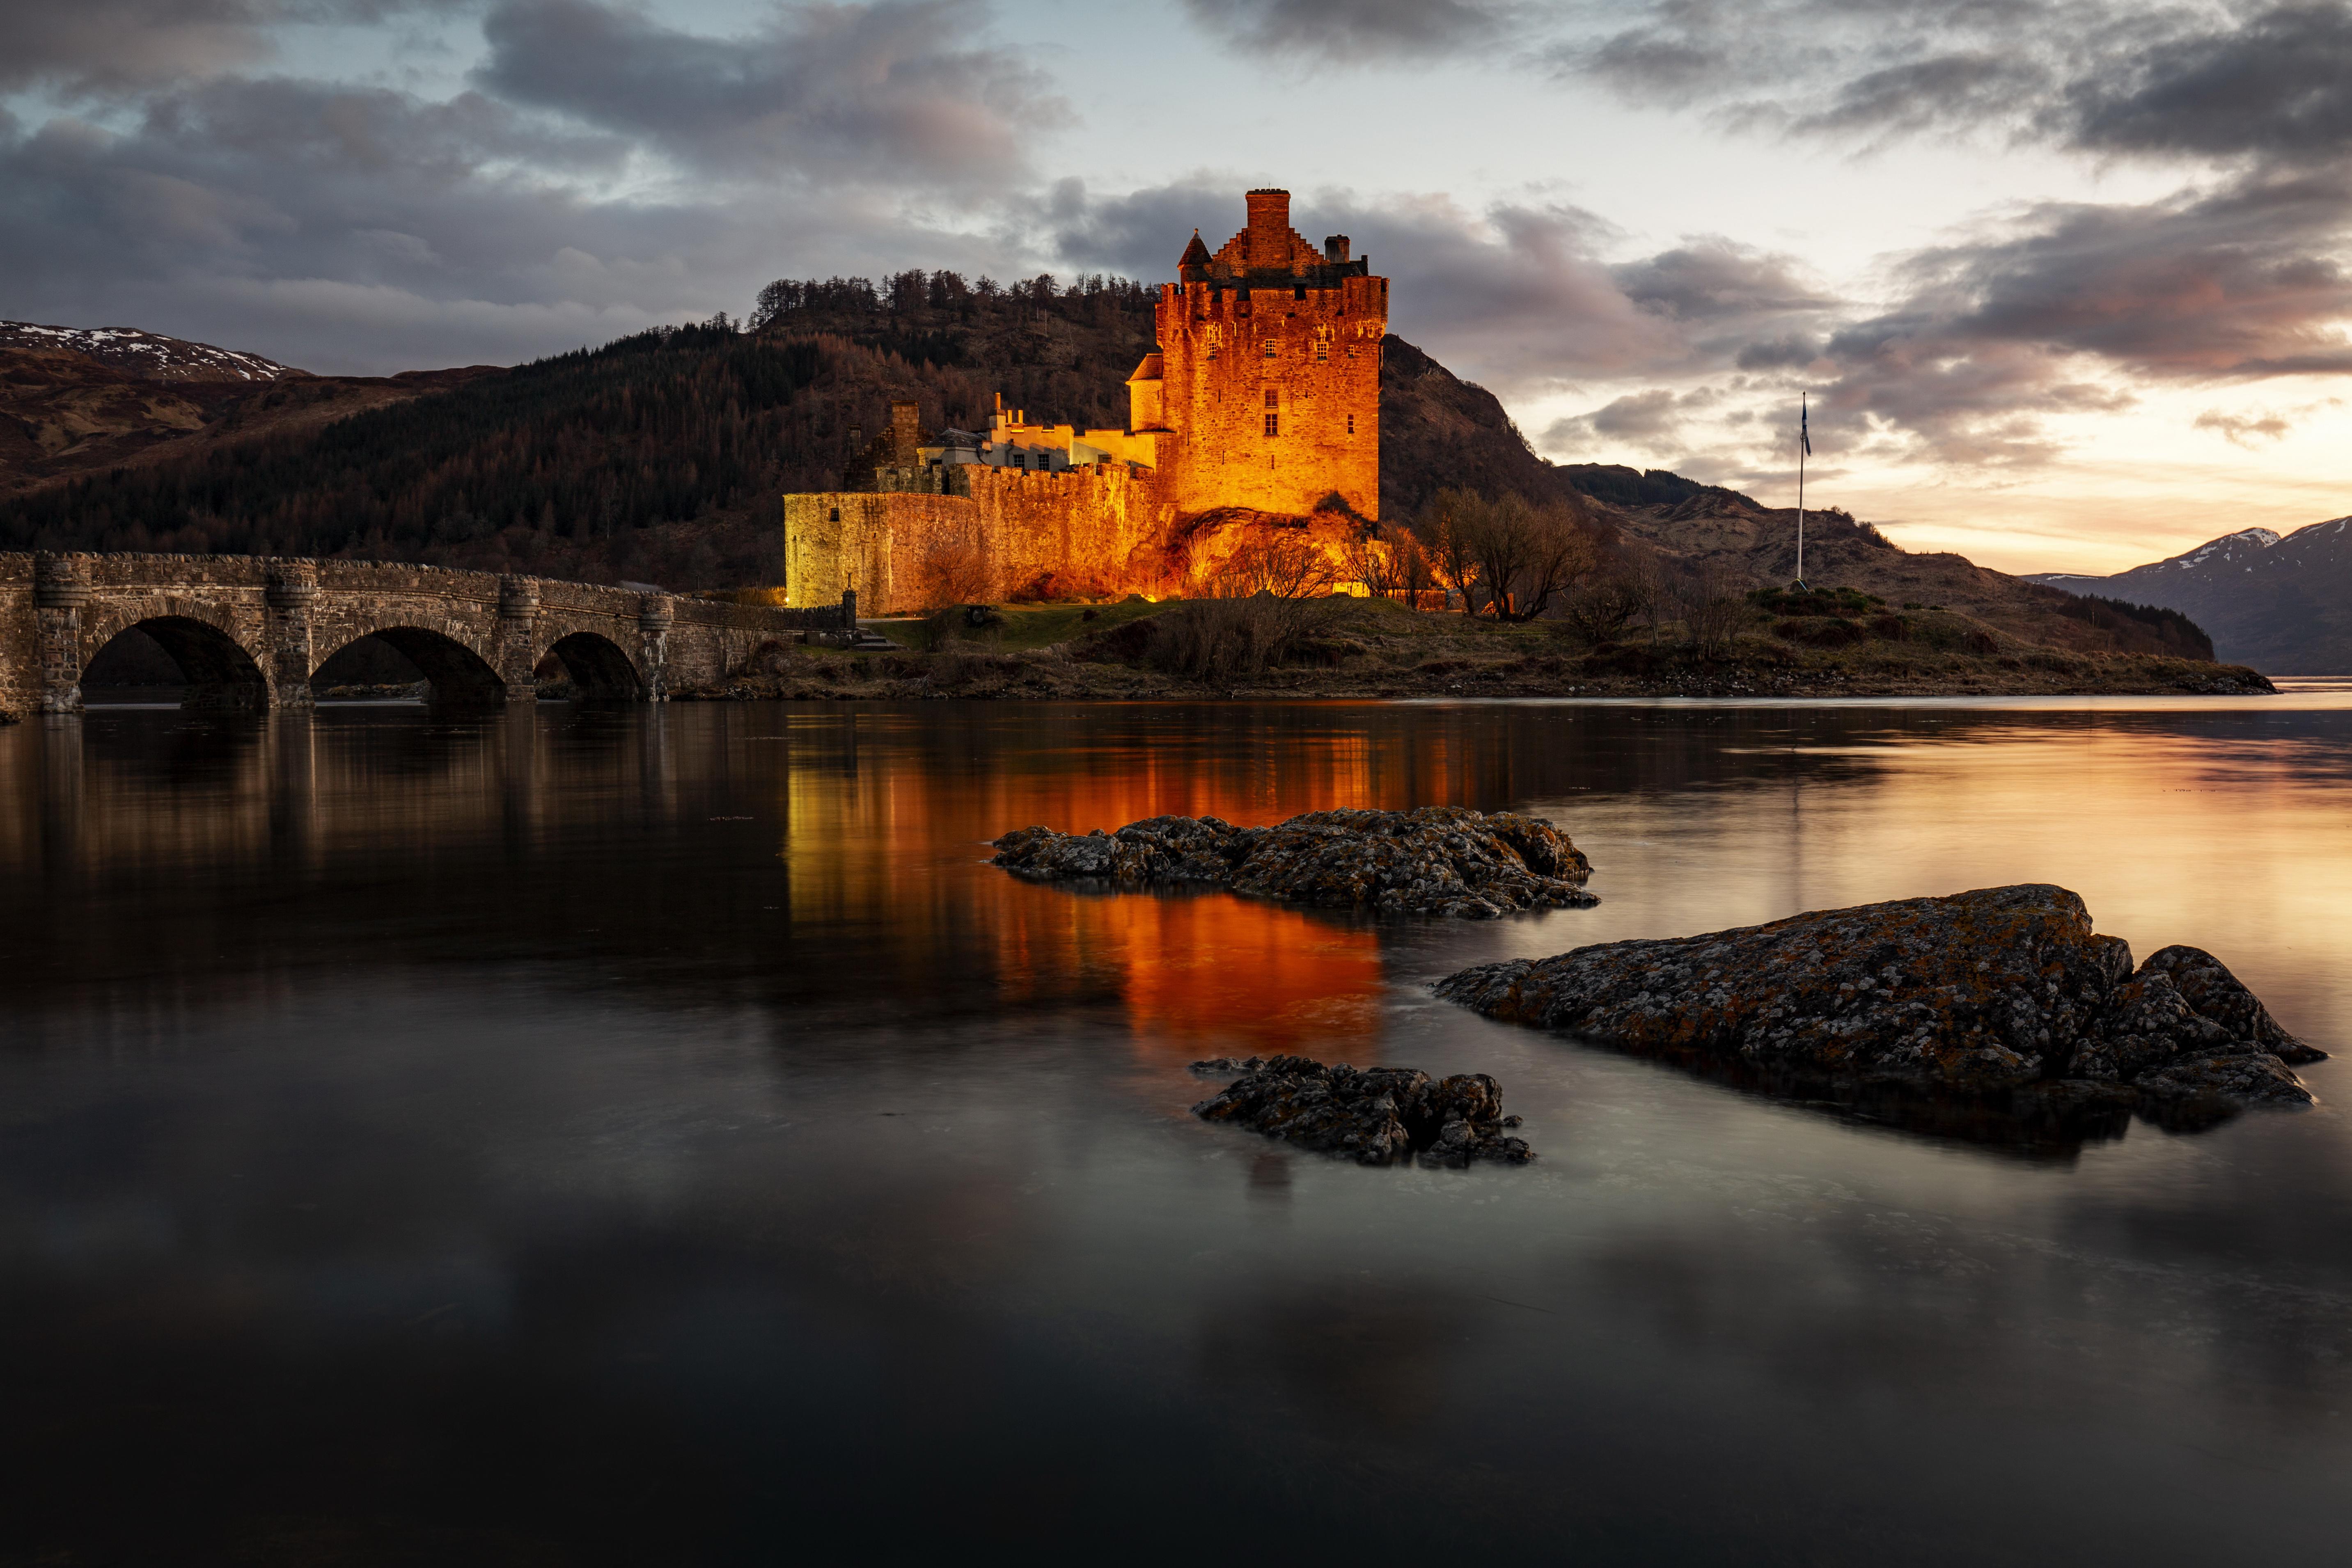 Bridge Castle Eilean Donan Castle Lake Scotland 5730x3820